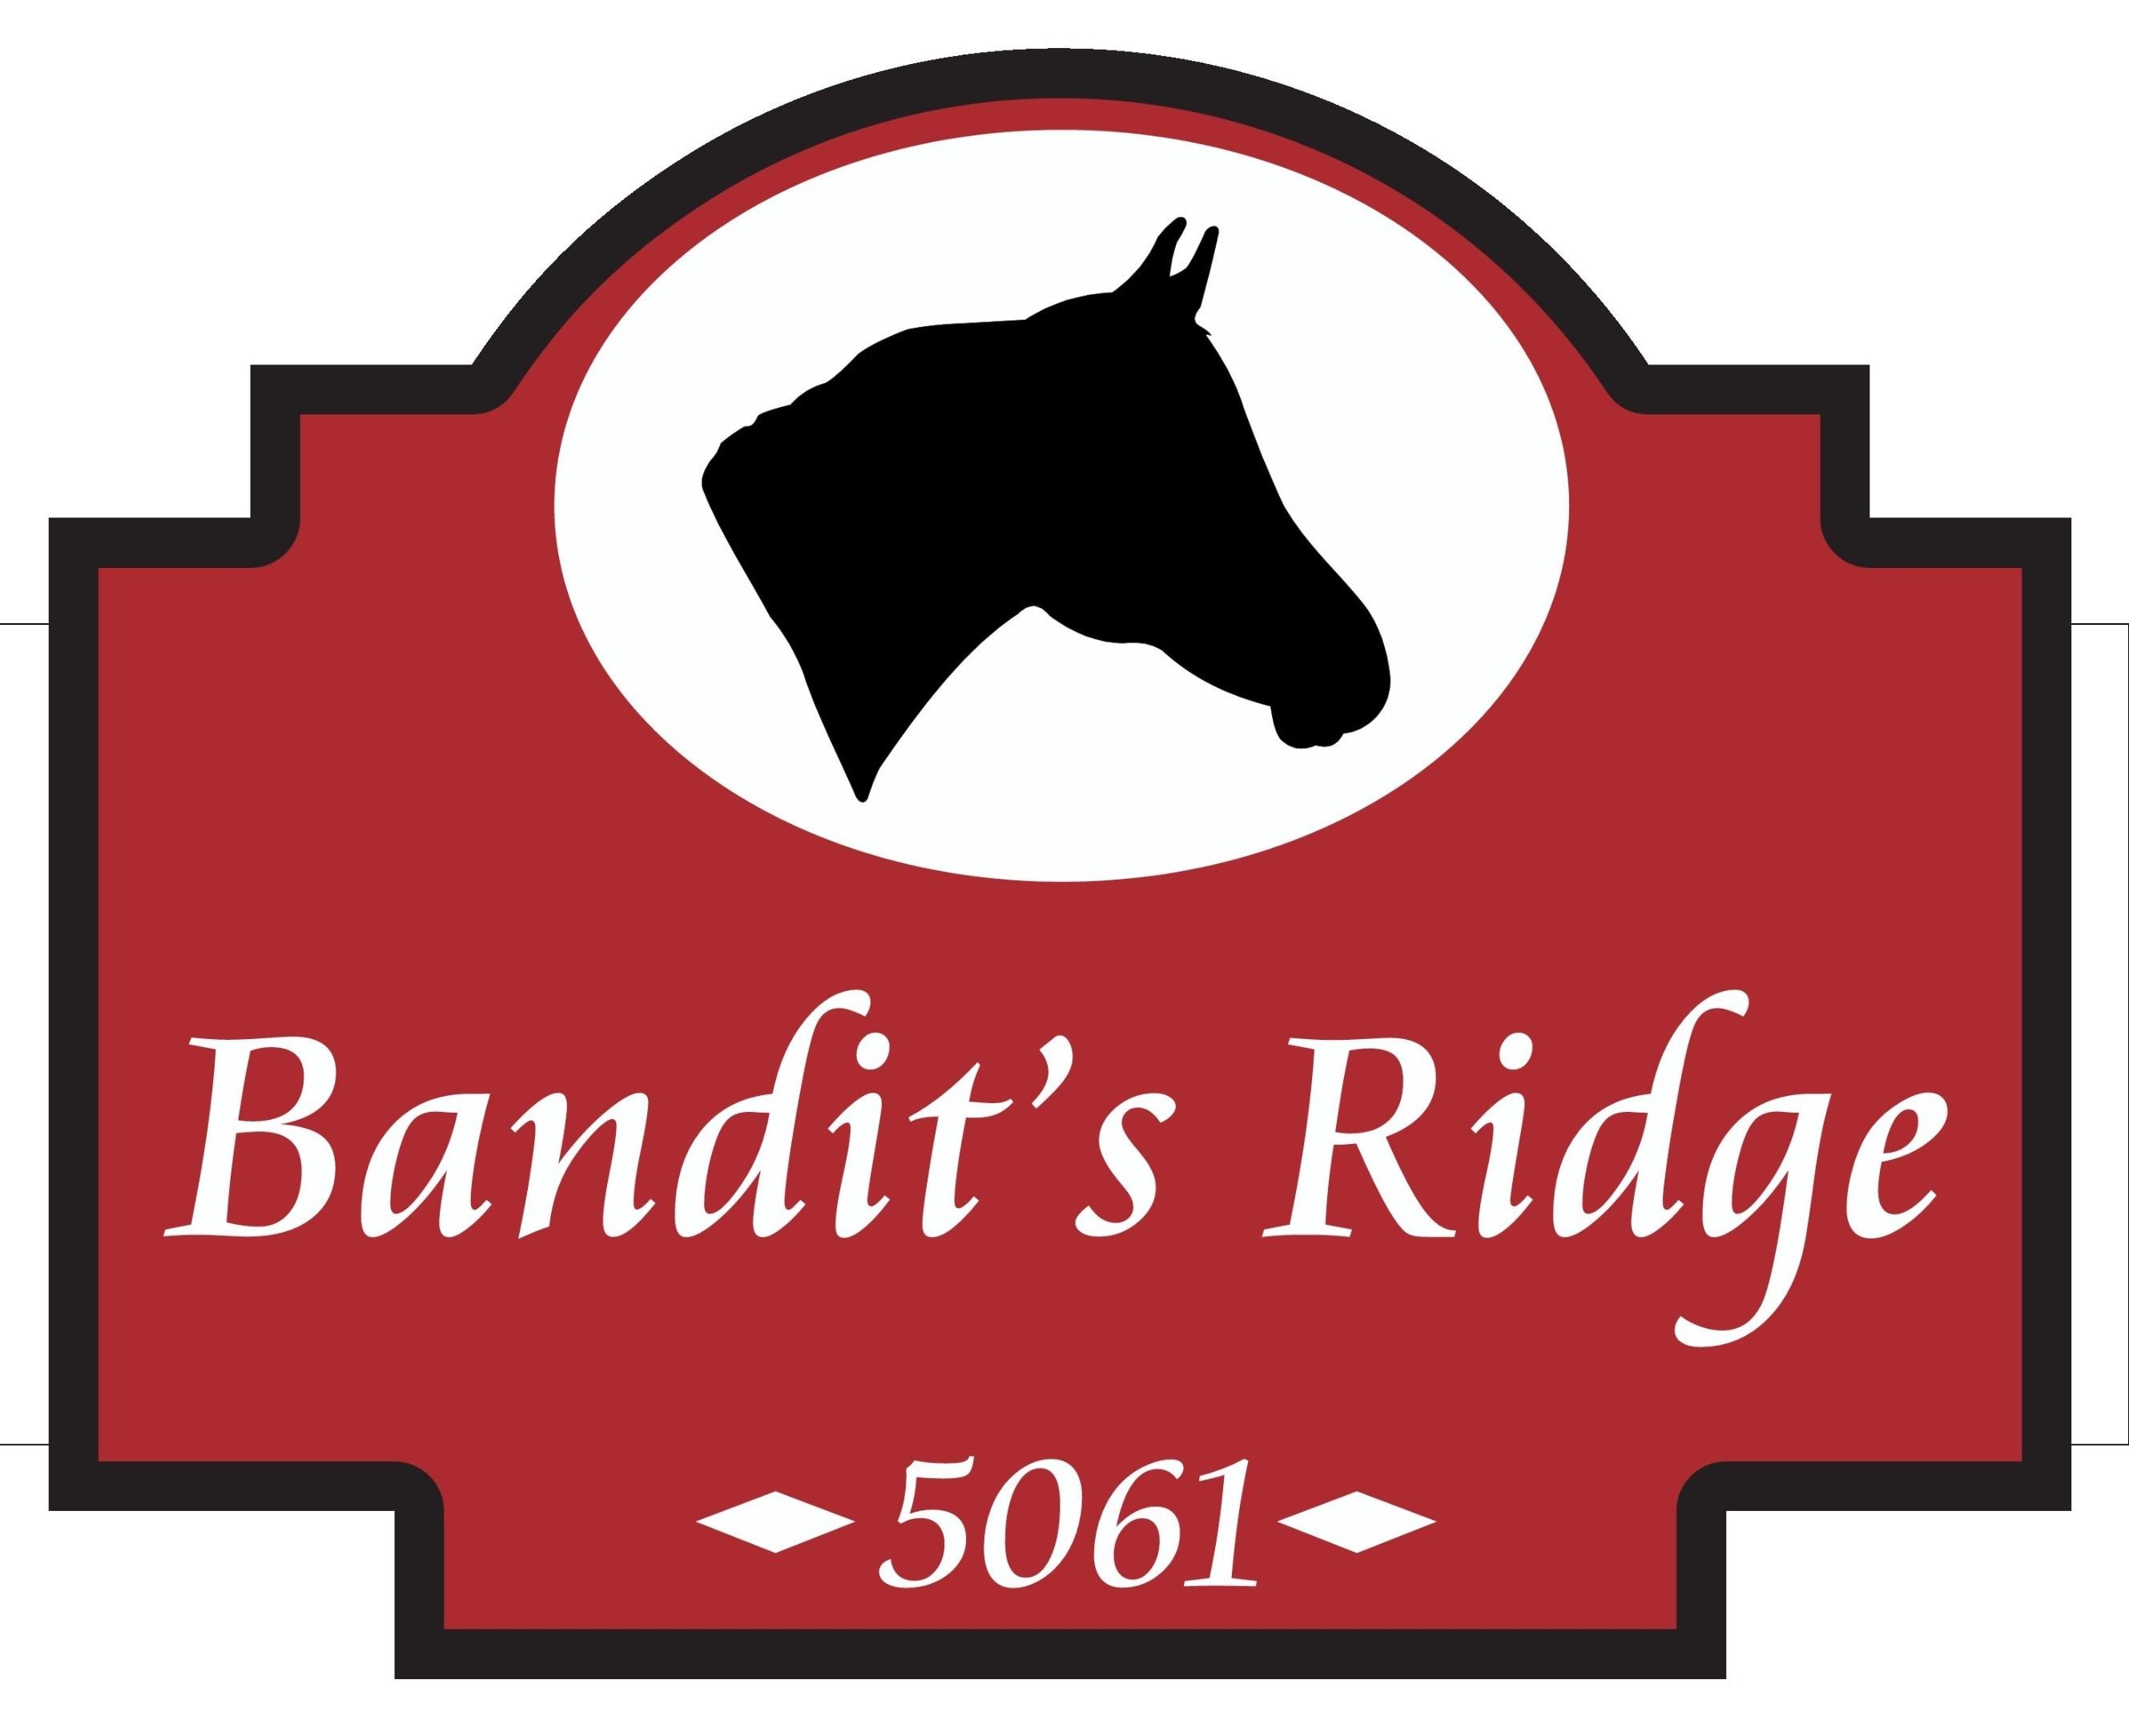 Bandit's Ridge